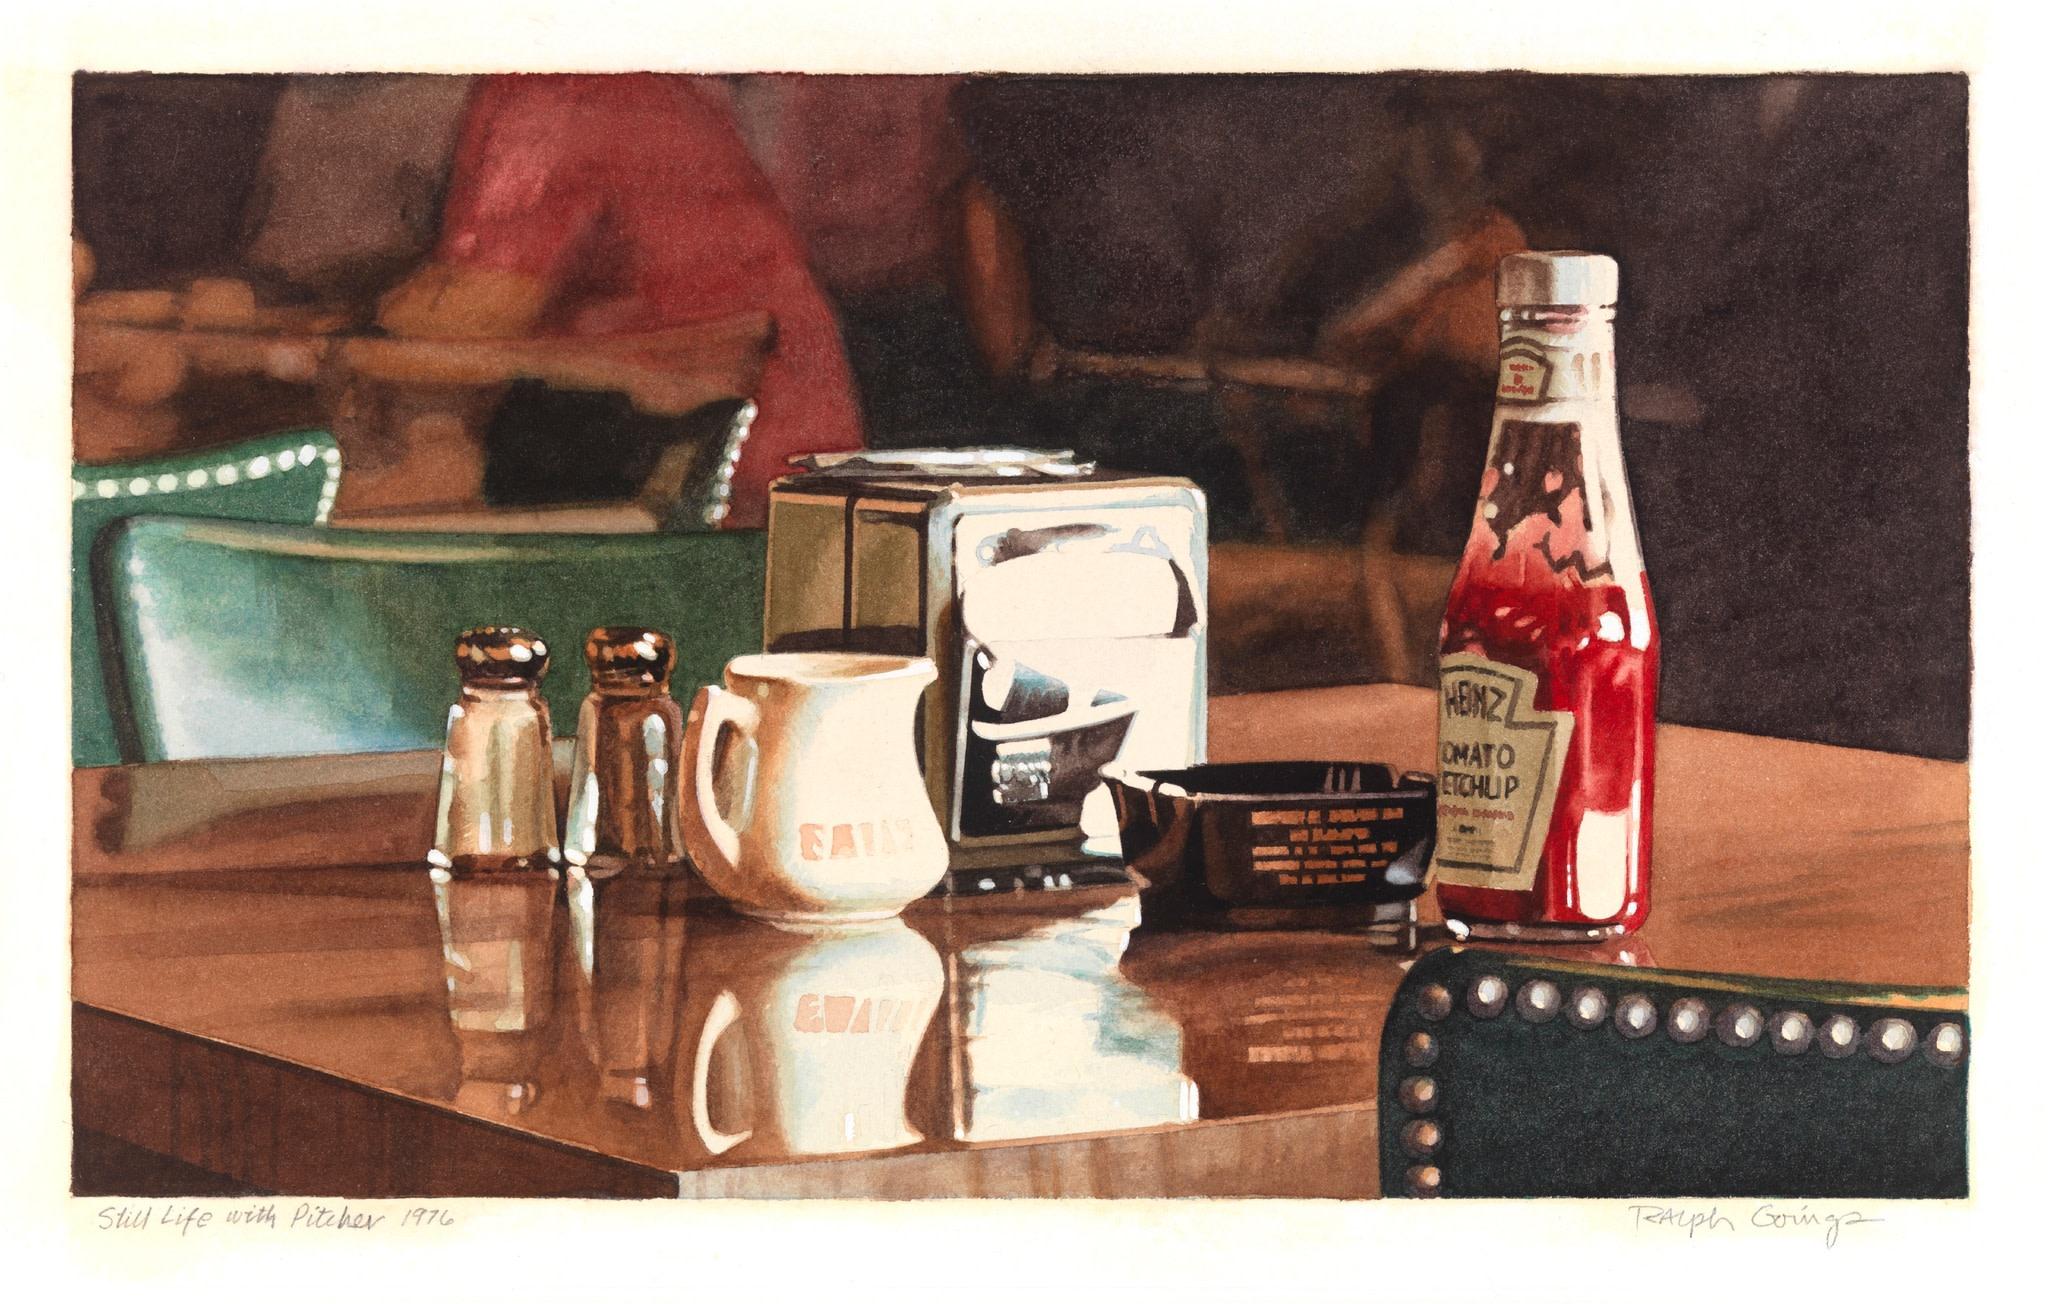 <span class=&#34;link fancybox-details-link&#34;><a href=&#34;/artists/113-ralph-goings/works/1578/&#34;>View Detail Page</a></span><div class=&#34;artist&#34;><strong>Ralph Goings</strong></div> <div class=&#34;title&#34;><em>Coffee shop still life</em></div> <div class=&#34;medium&#34;>watercolour on paper</div> <div class=&#34;dimensions&#34;>23 x 21 cm</div>